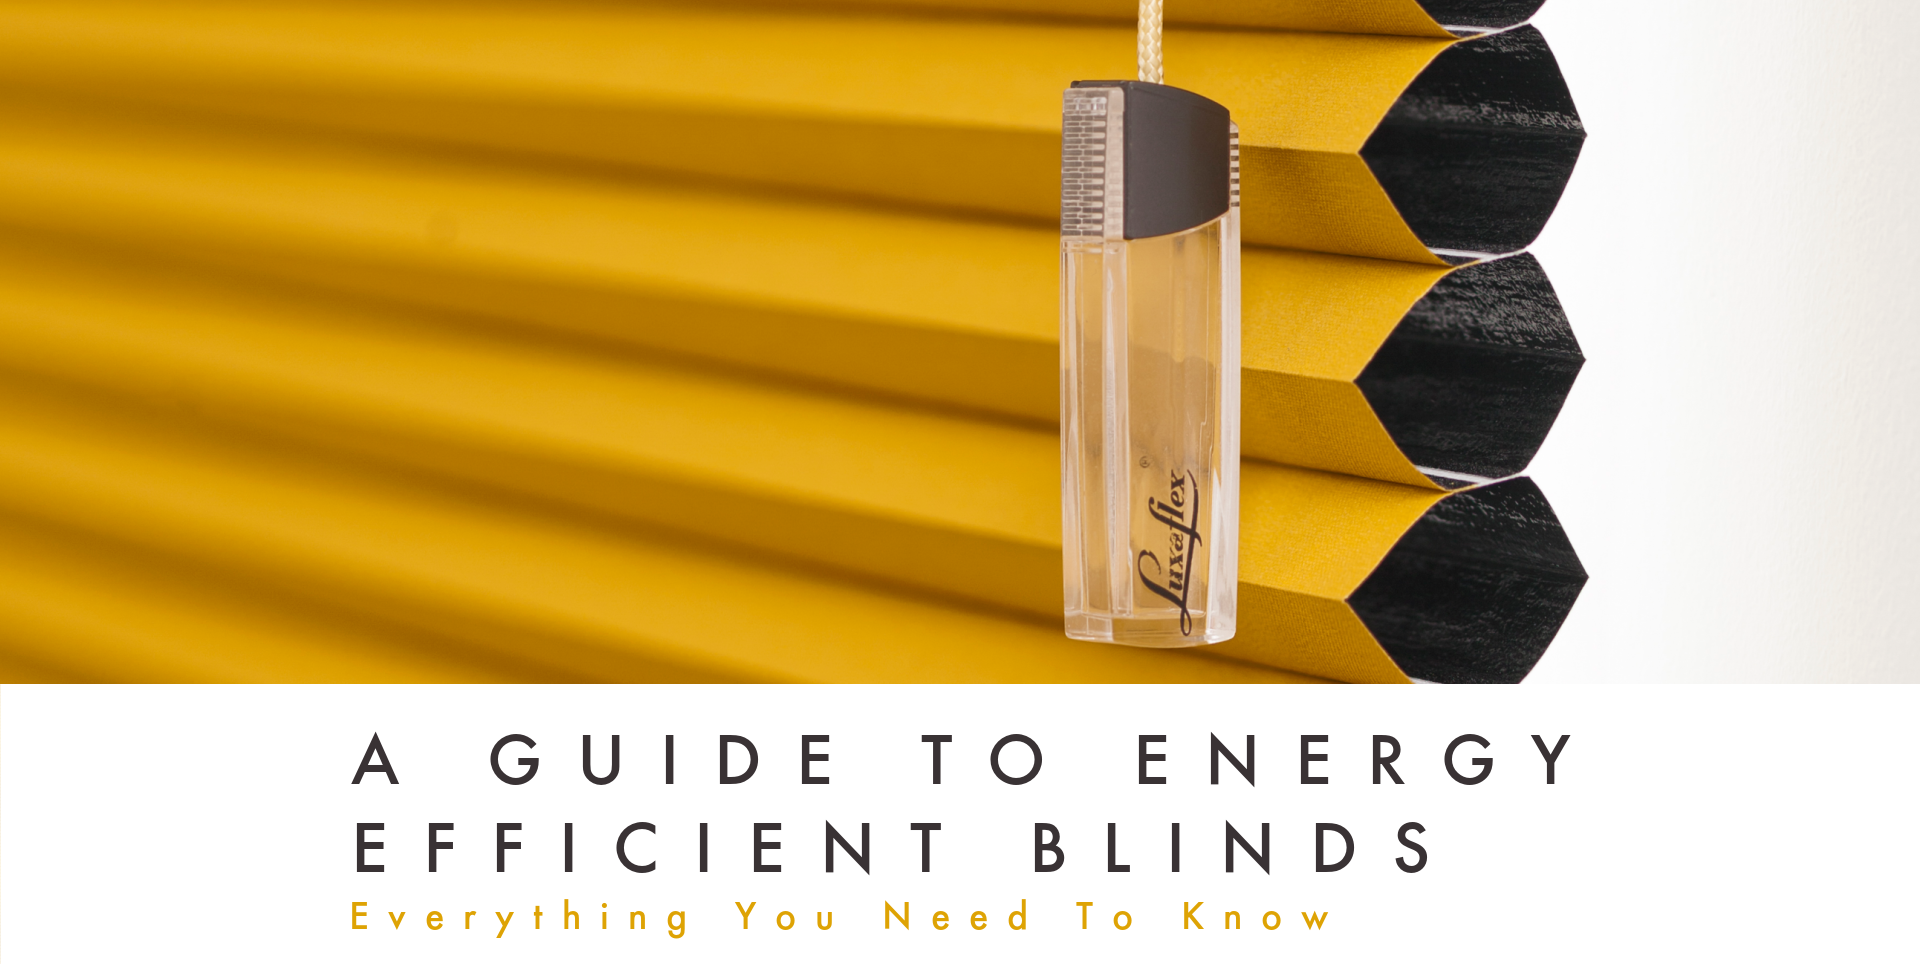 Energy efficient blind guide promo banner